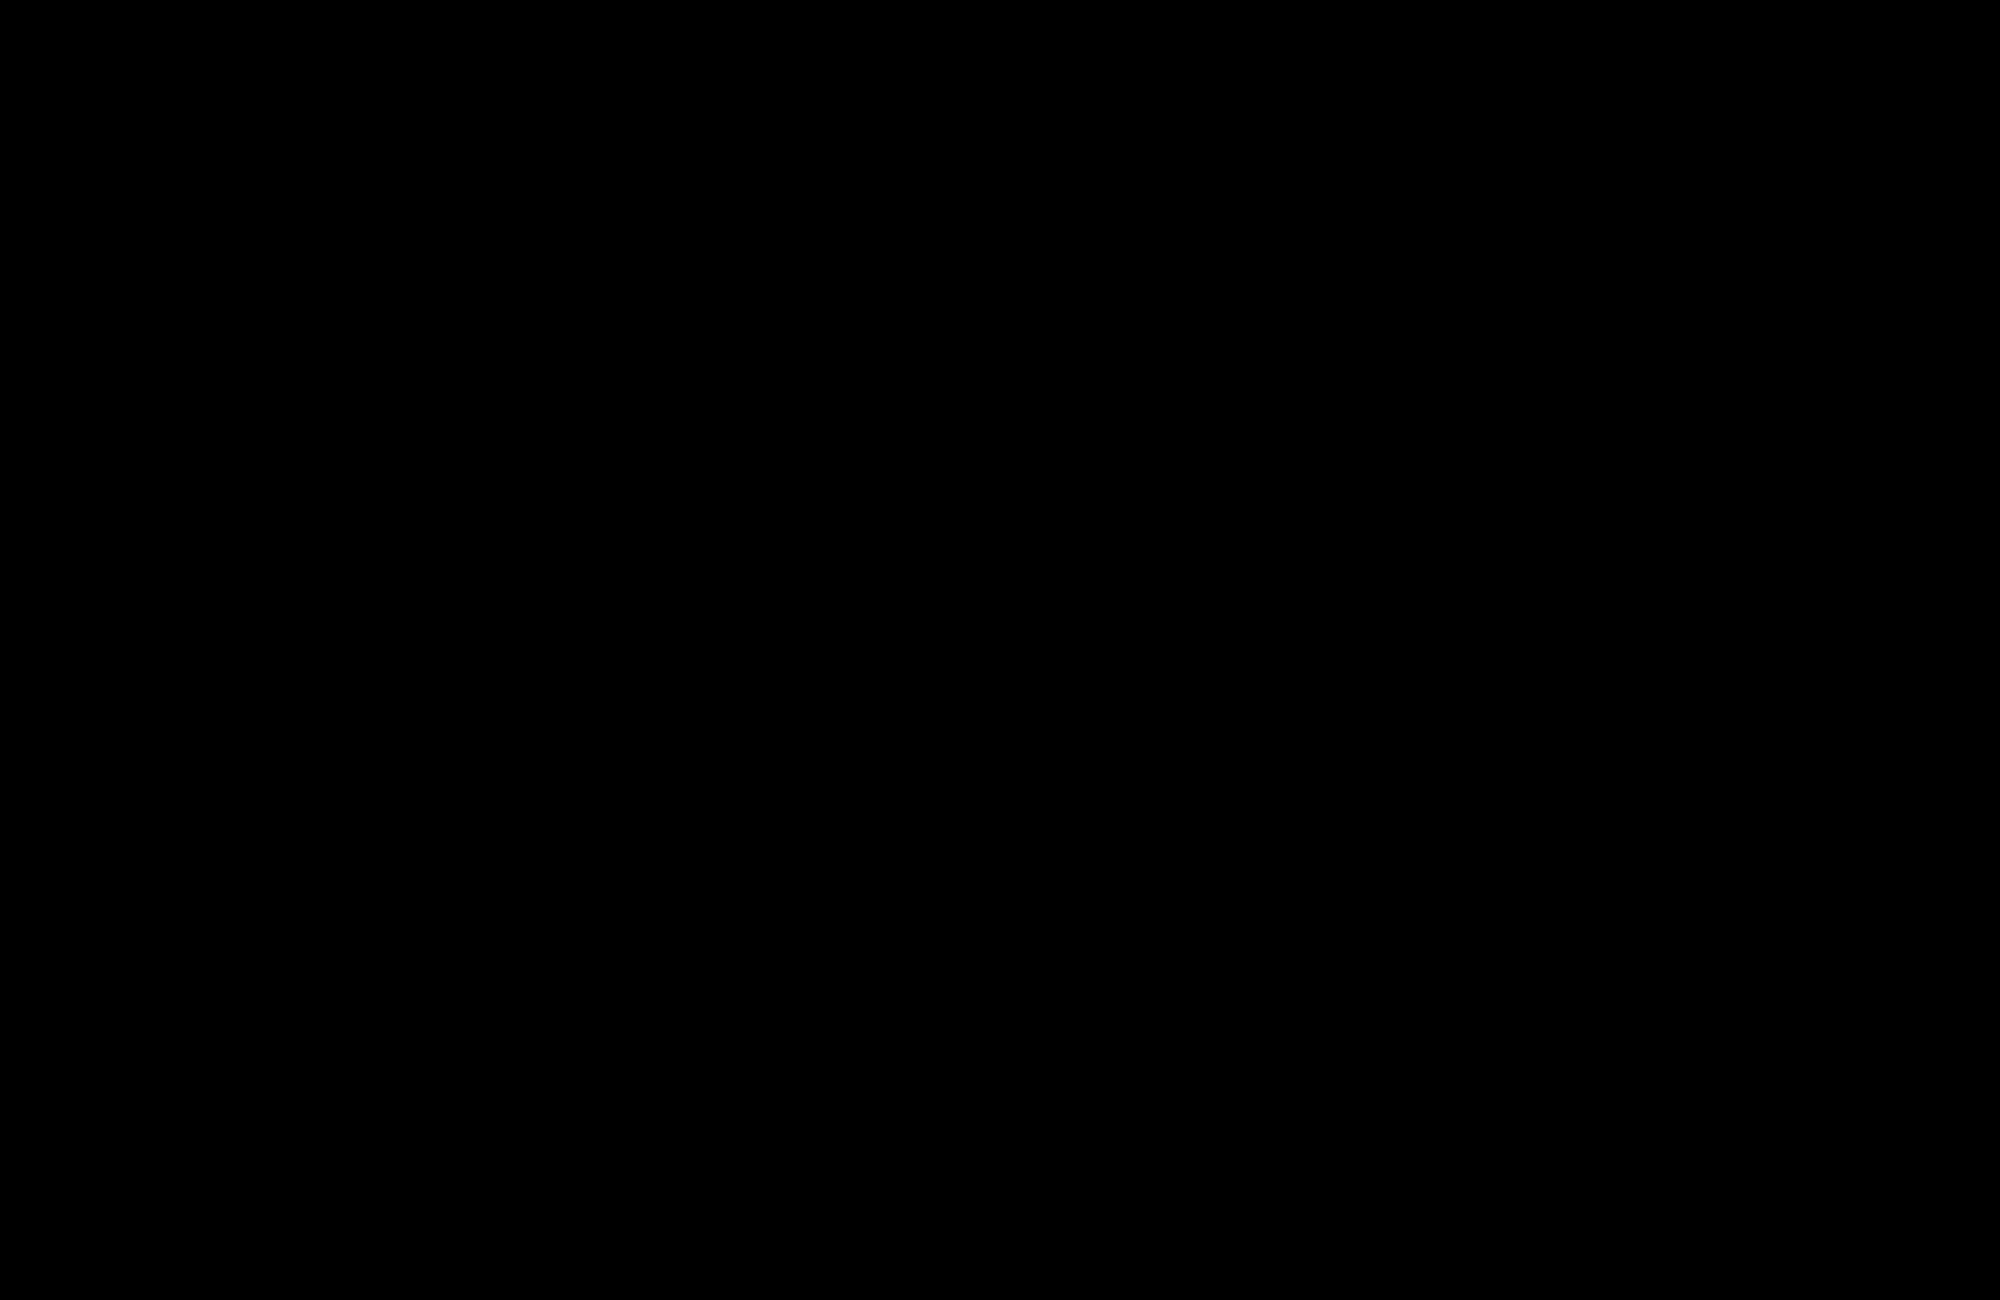 Schematic Diagram Symbols With Names